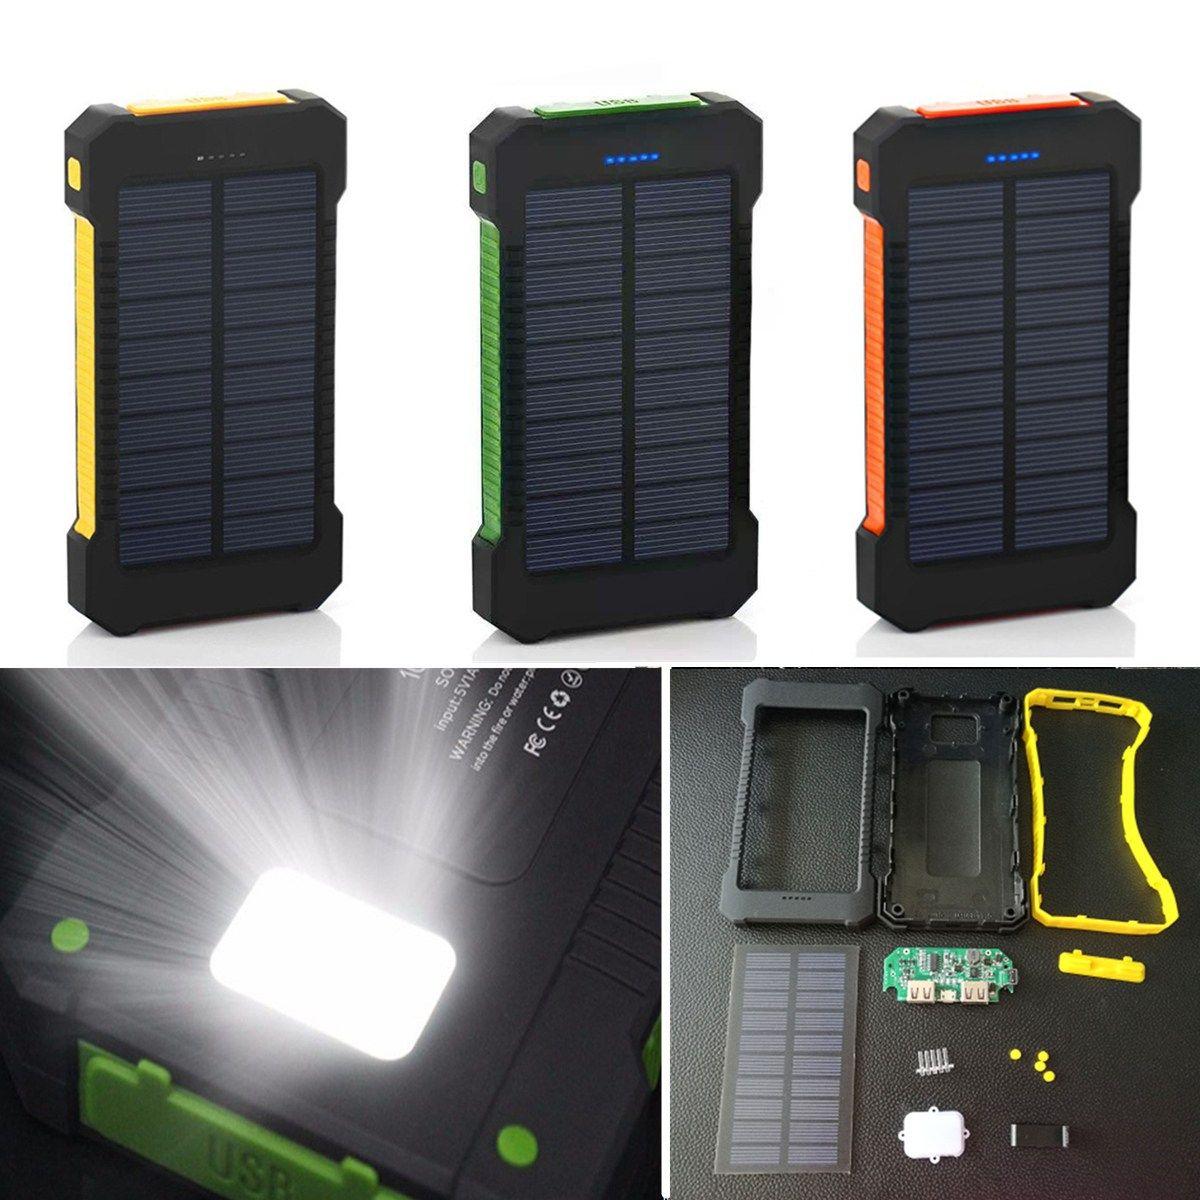 Bakeey F5 10000mah Solar Panel Led Dual Usb Ports Diy Power Bank Case Battery Charger Kits Box Power Bank Case Powerbank Battery Charger